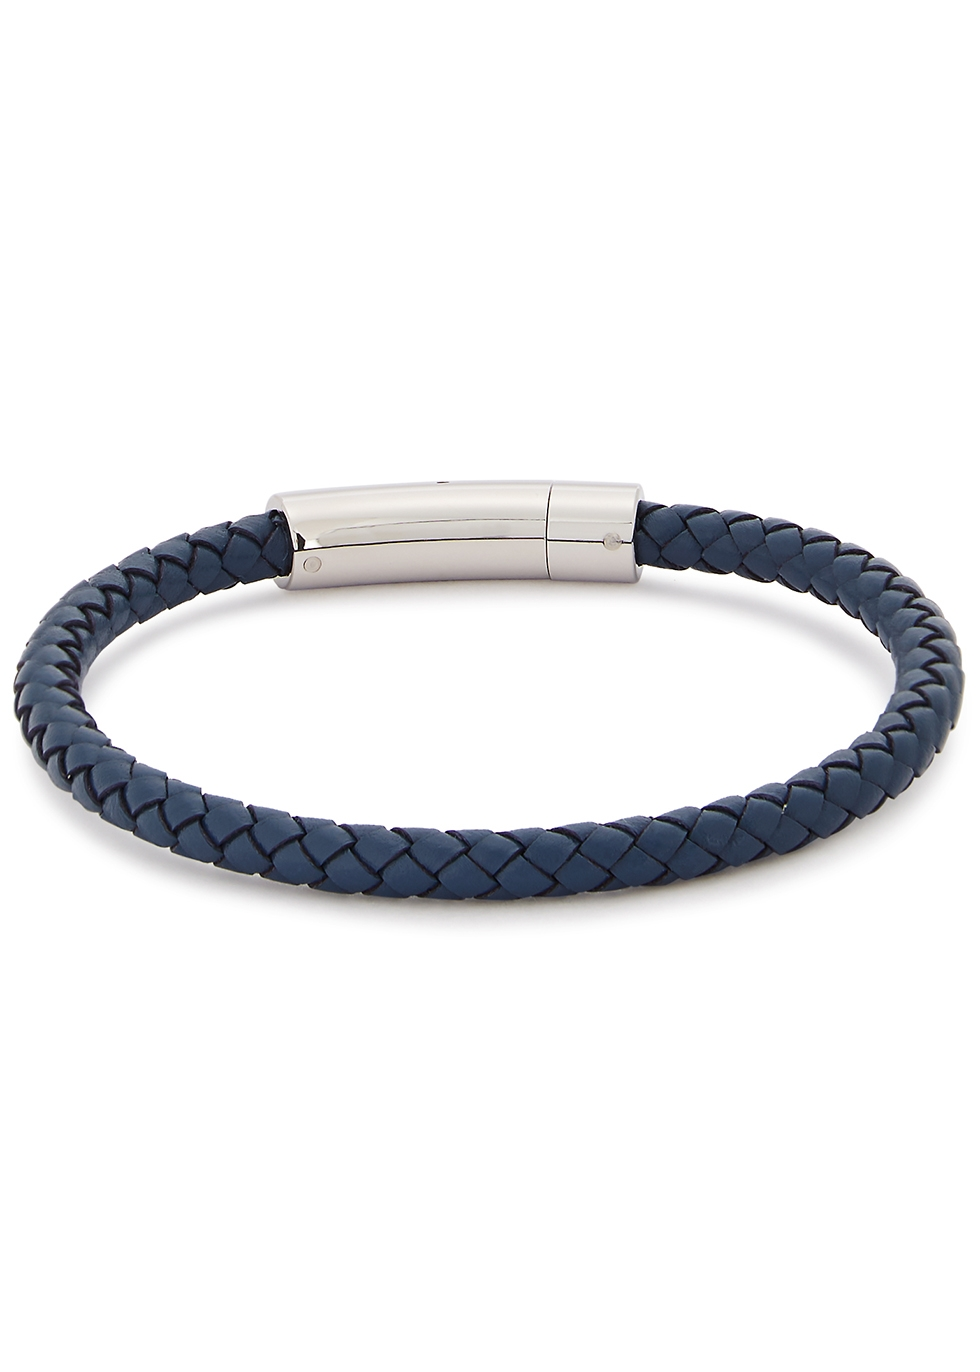 Blue woven leather bracelet